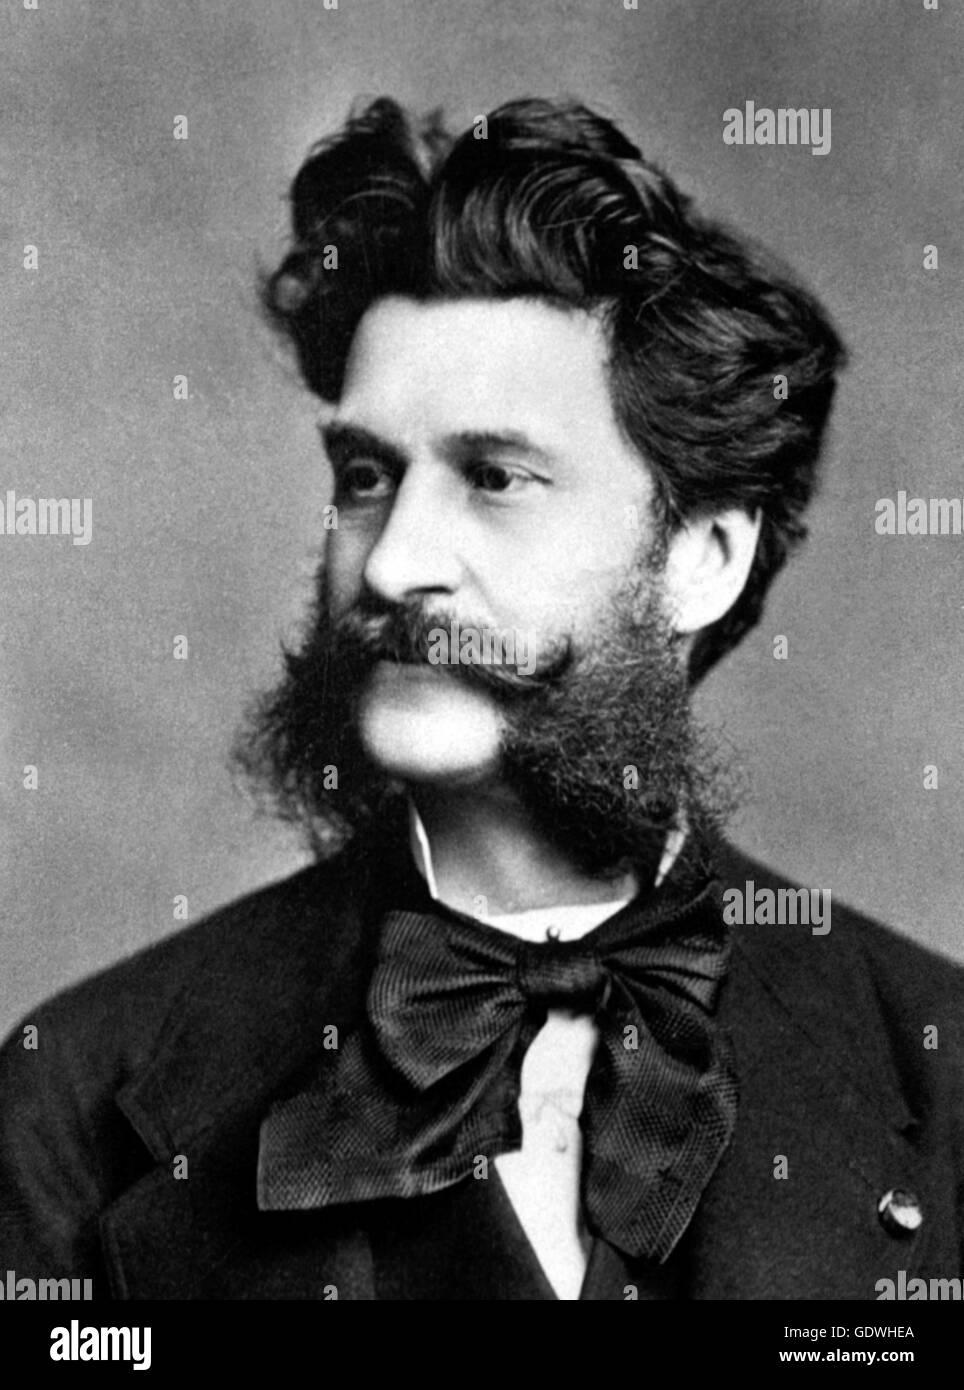 Johann Strauss. Portrait of the Austrian composer. - Stock Image